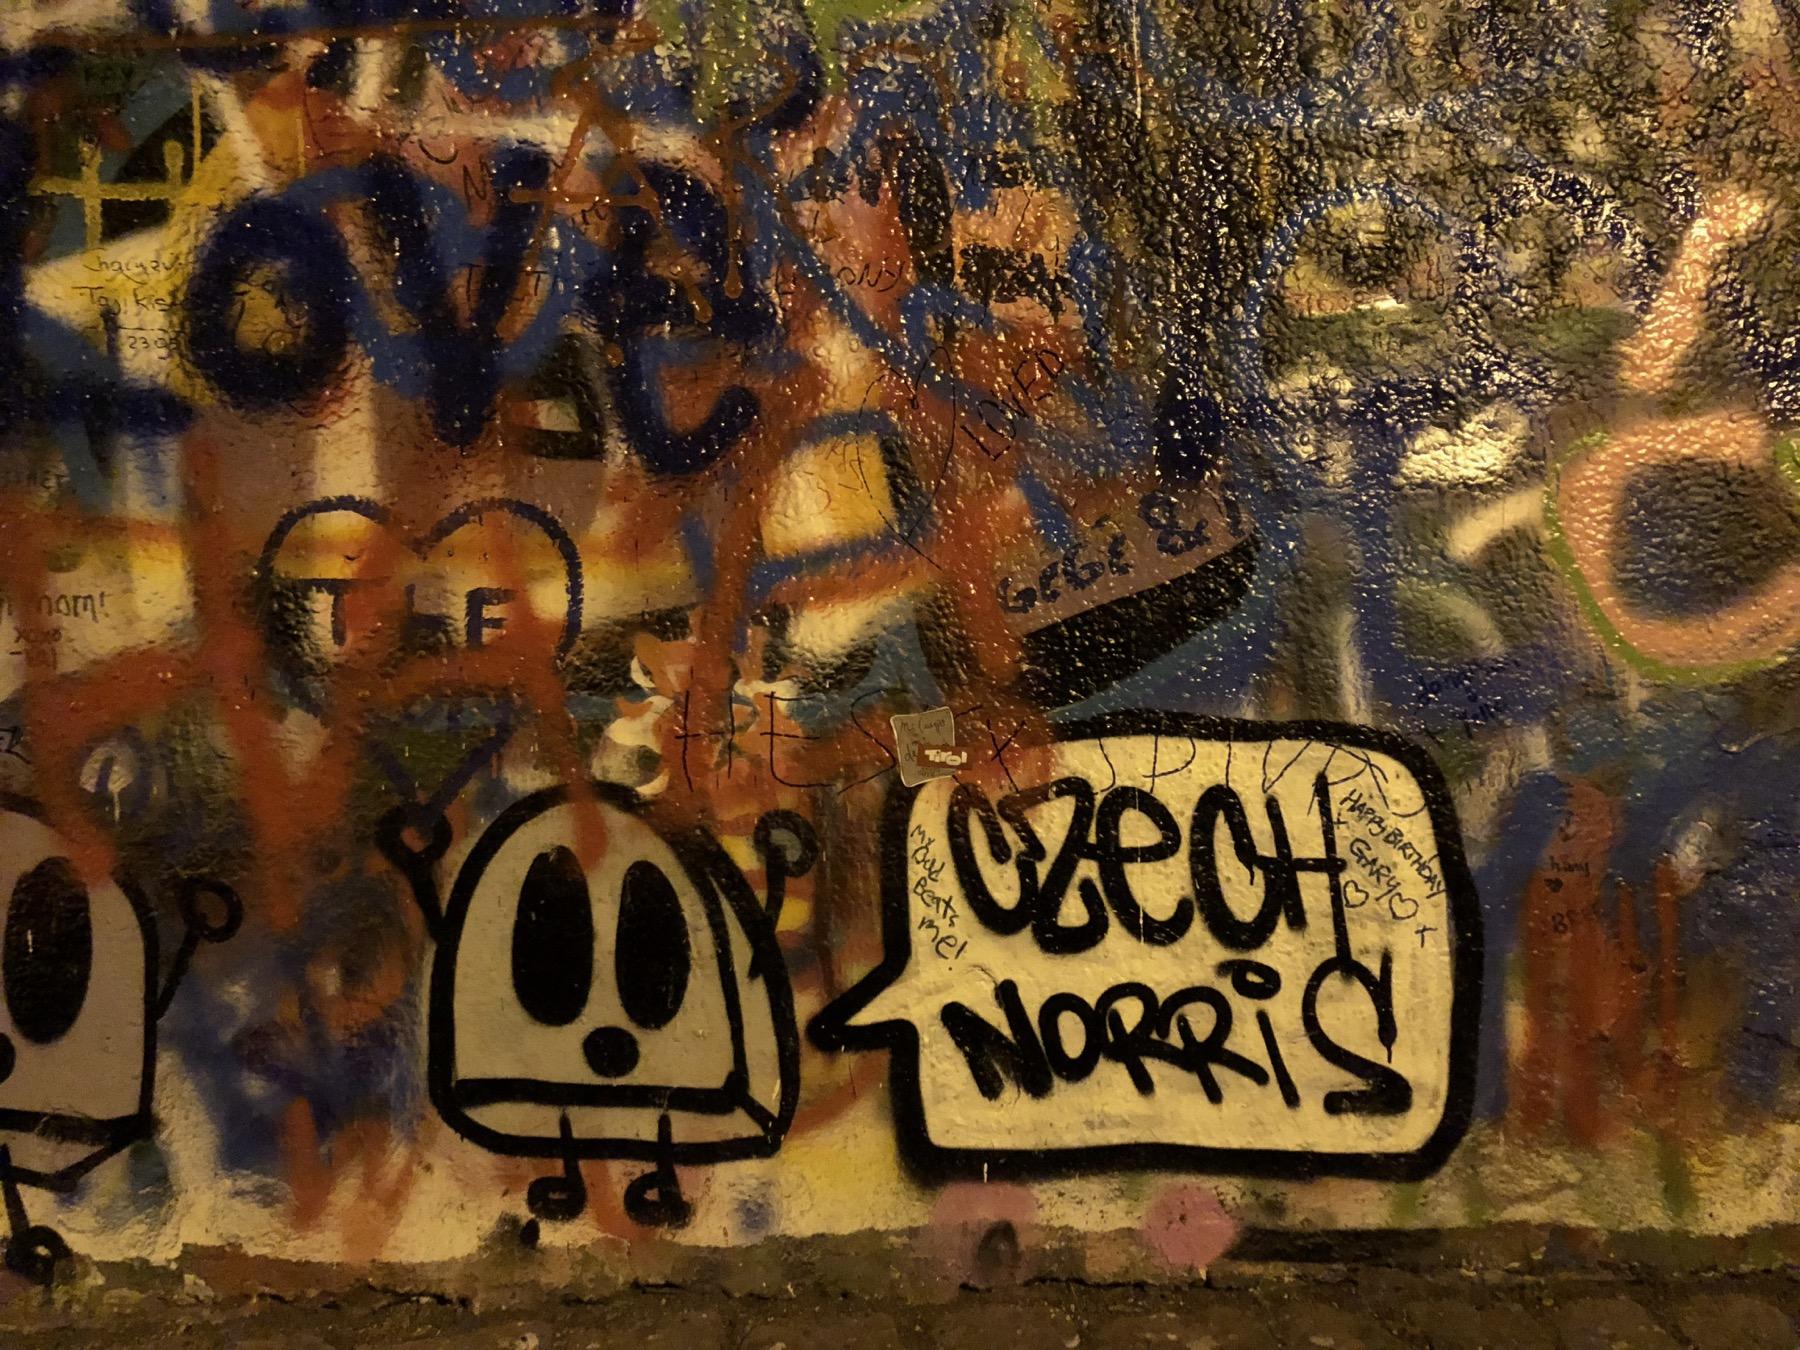 fun graffiti on the john lennon wall_resized_07:25:2019.jpg